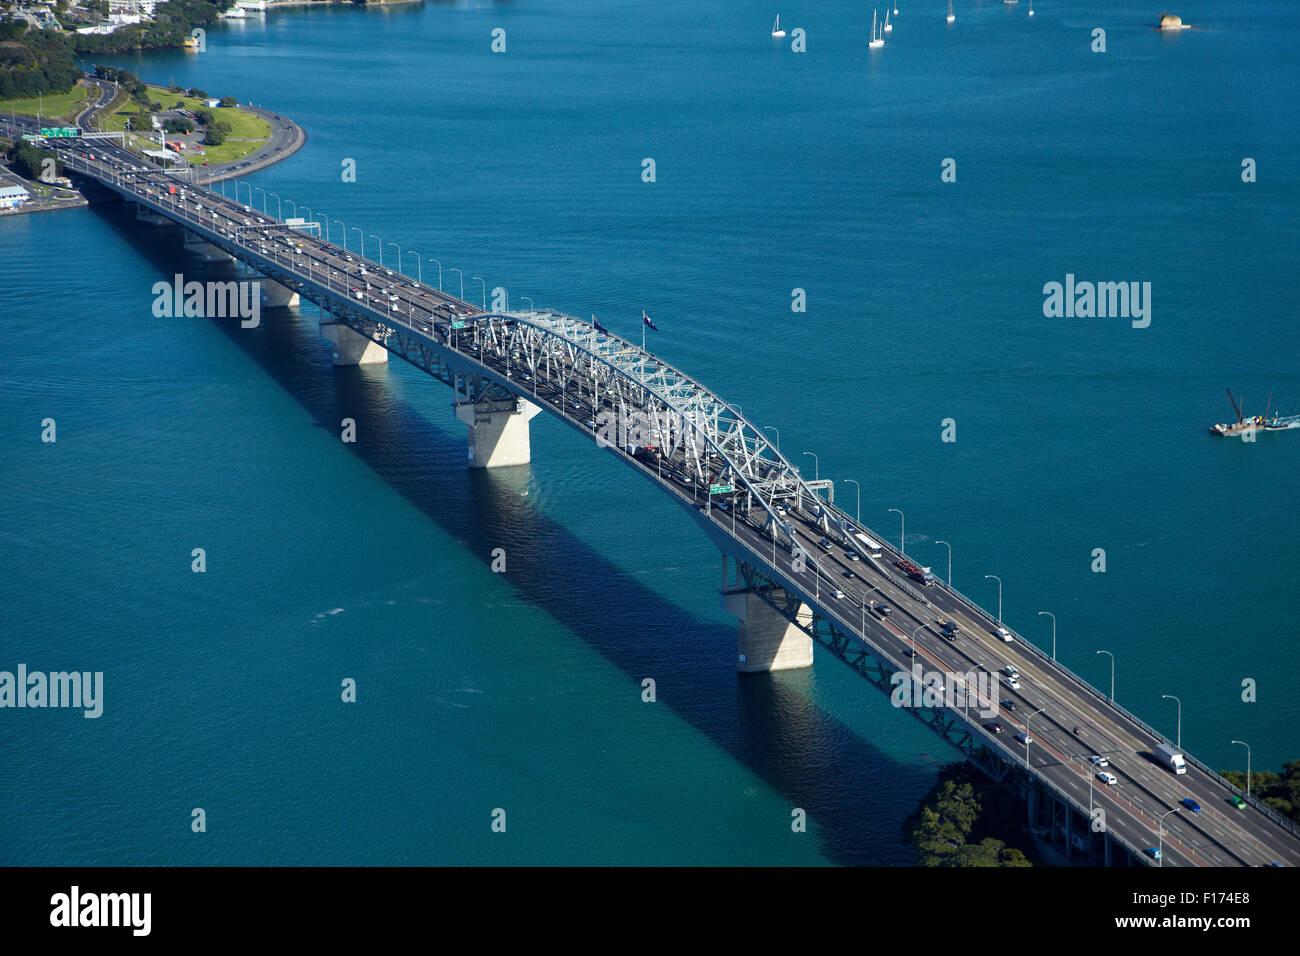 Auckland Harbour Bridge and Waitemata Harbour, Auckland, North Island, New Zealand - aerial - Stock Image